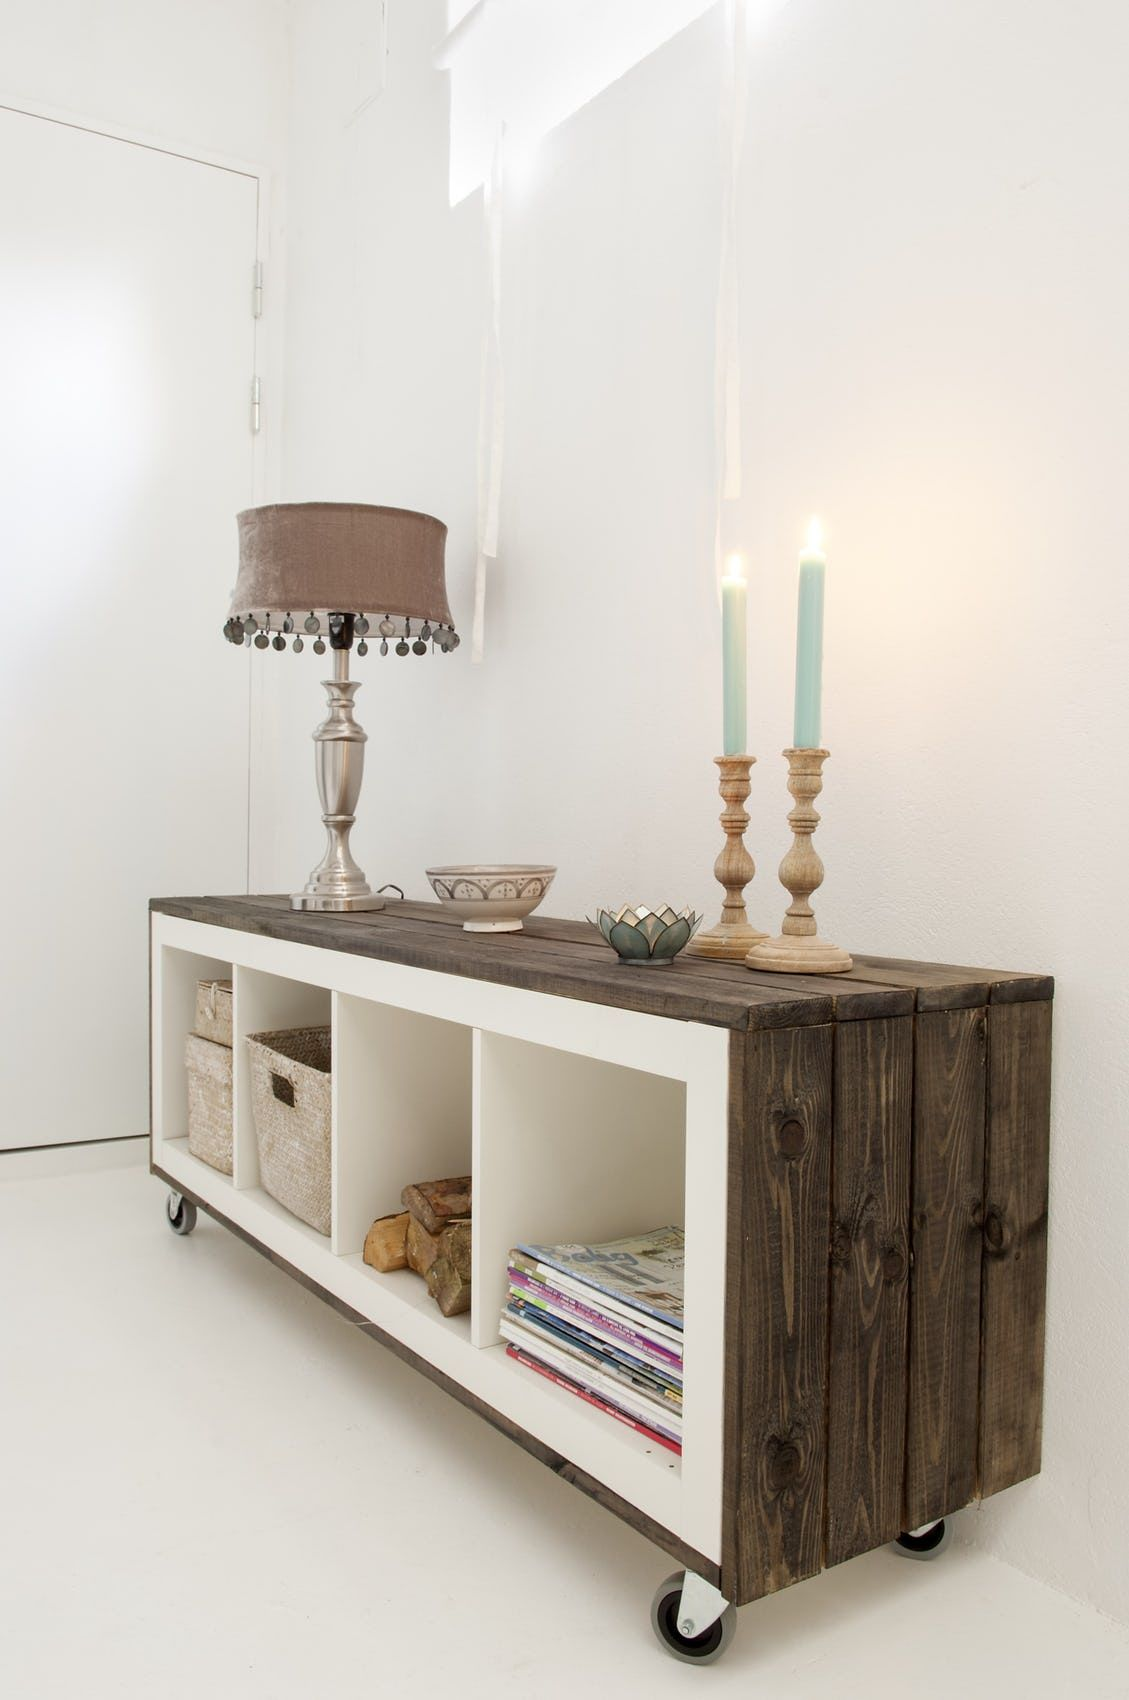 pimp opp ikea m belet diy pinterest rustic sideboard diy furniture and dark stains. Black Bedroom Furniture Sets. Home Design Ideas